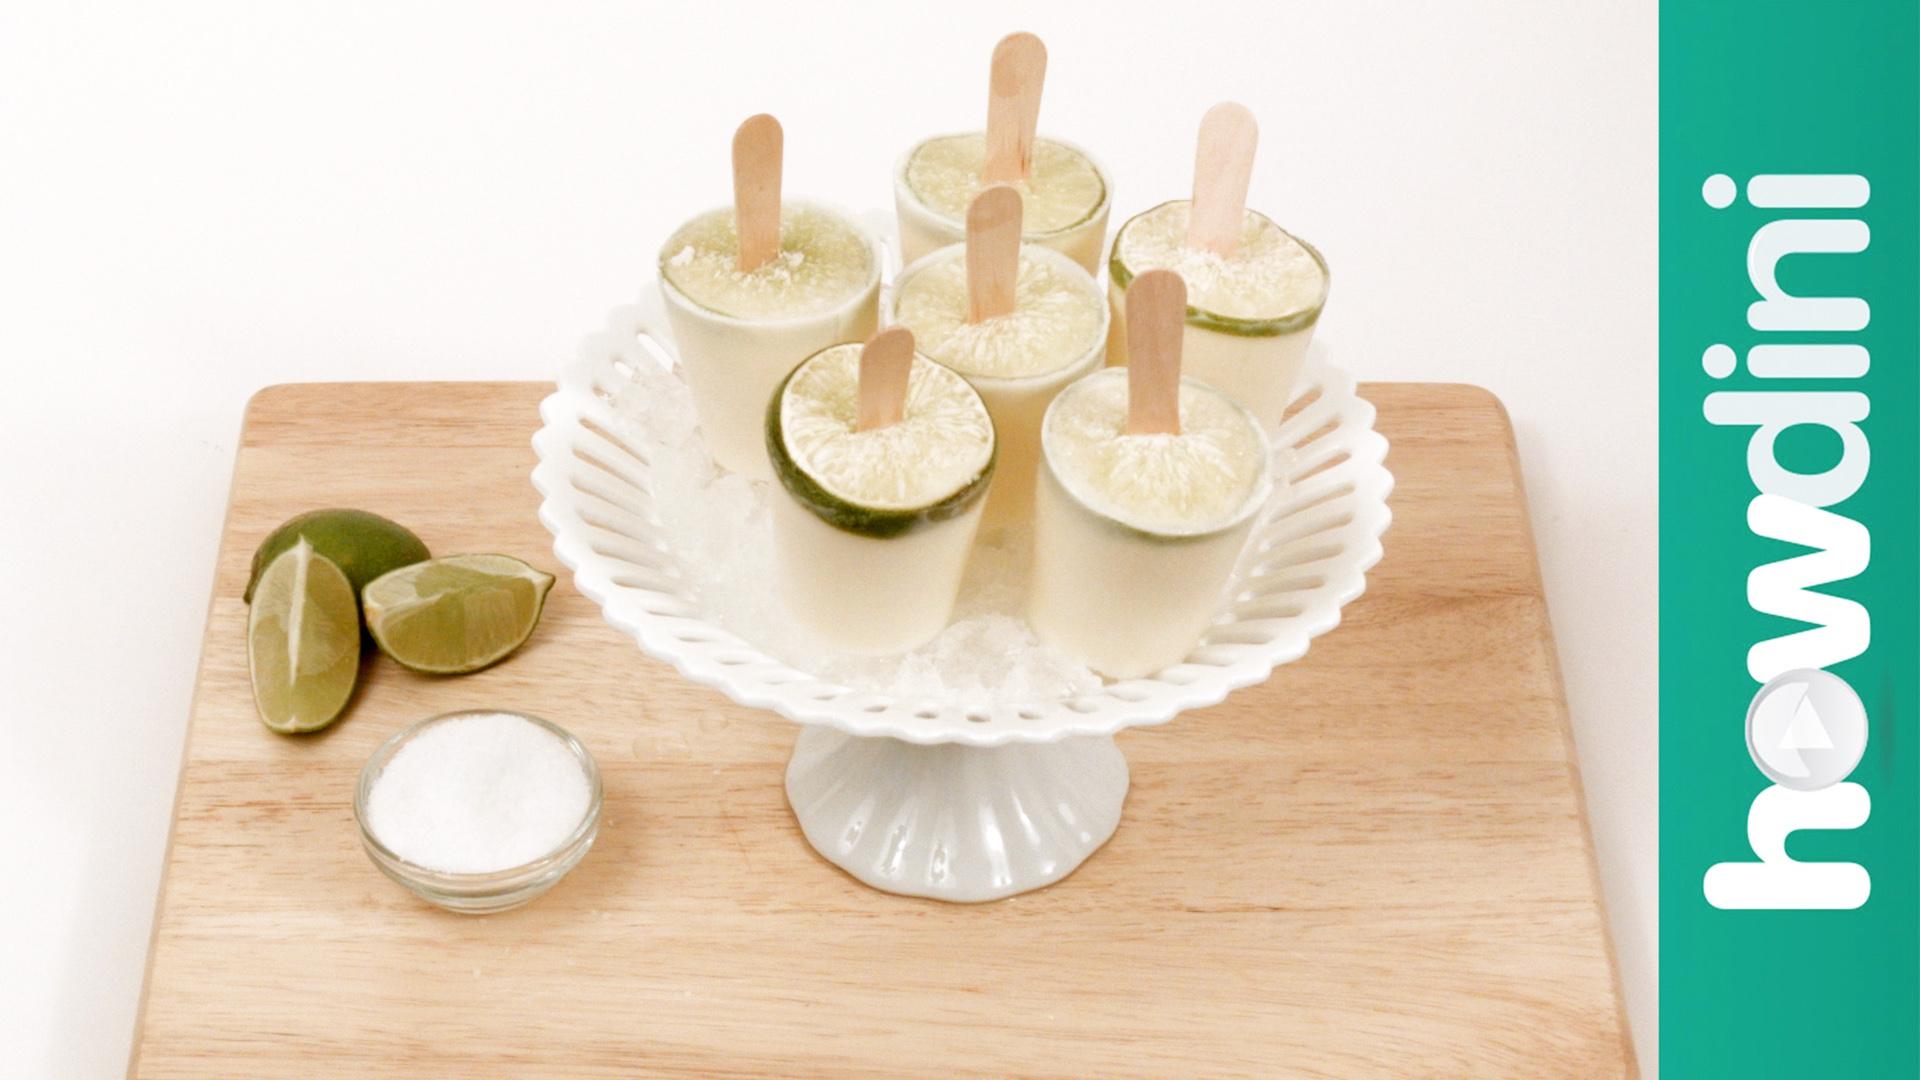 How to Make Margarita Creamsicles